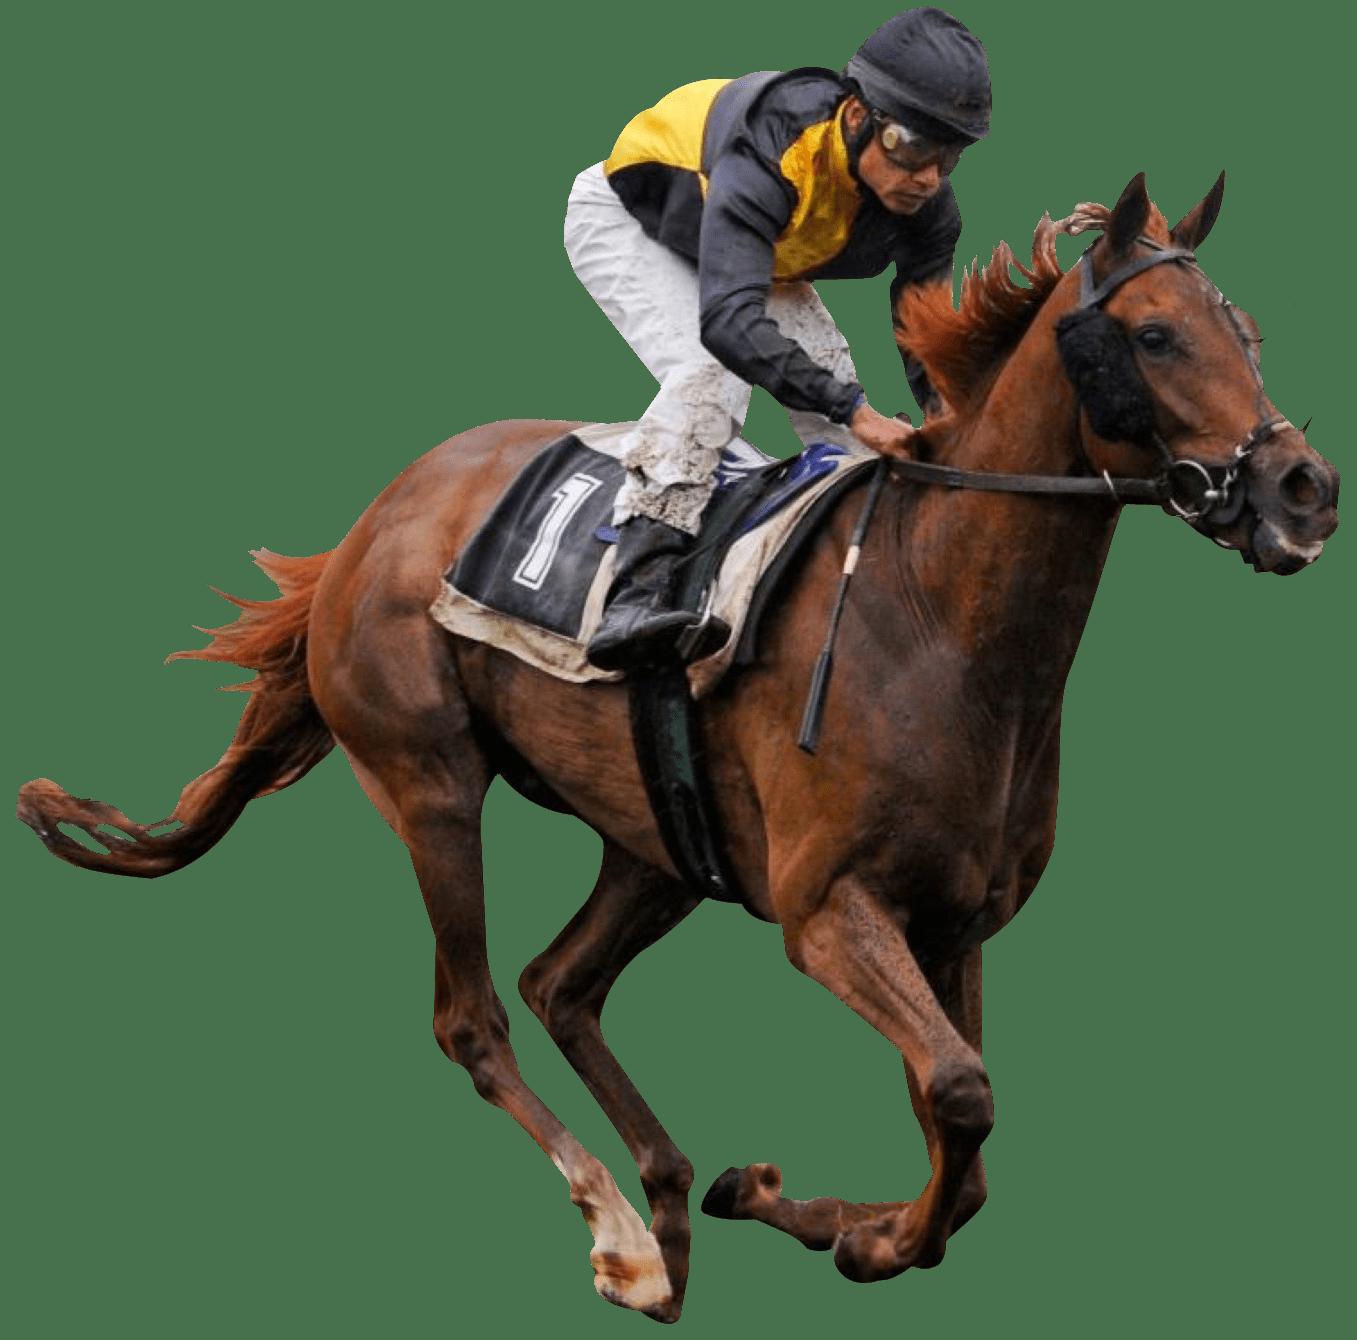 PNG Jockey - 51899